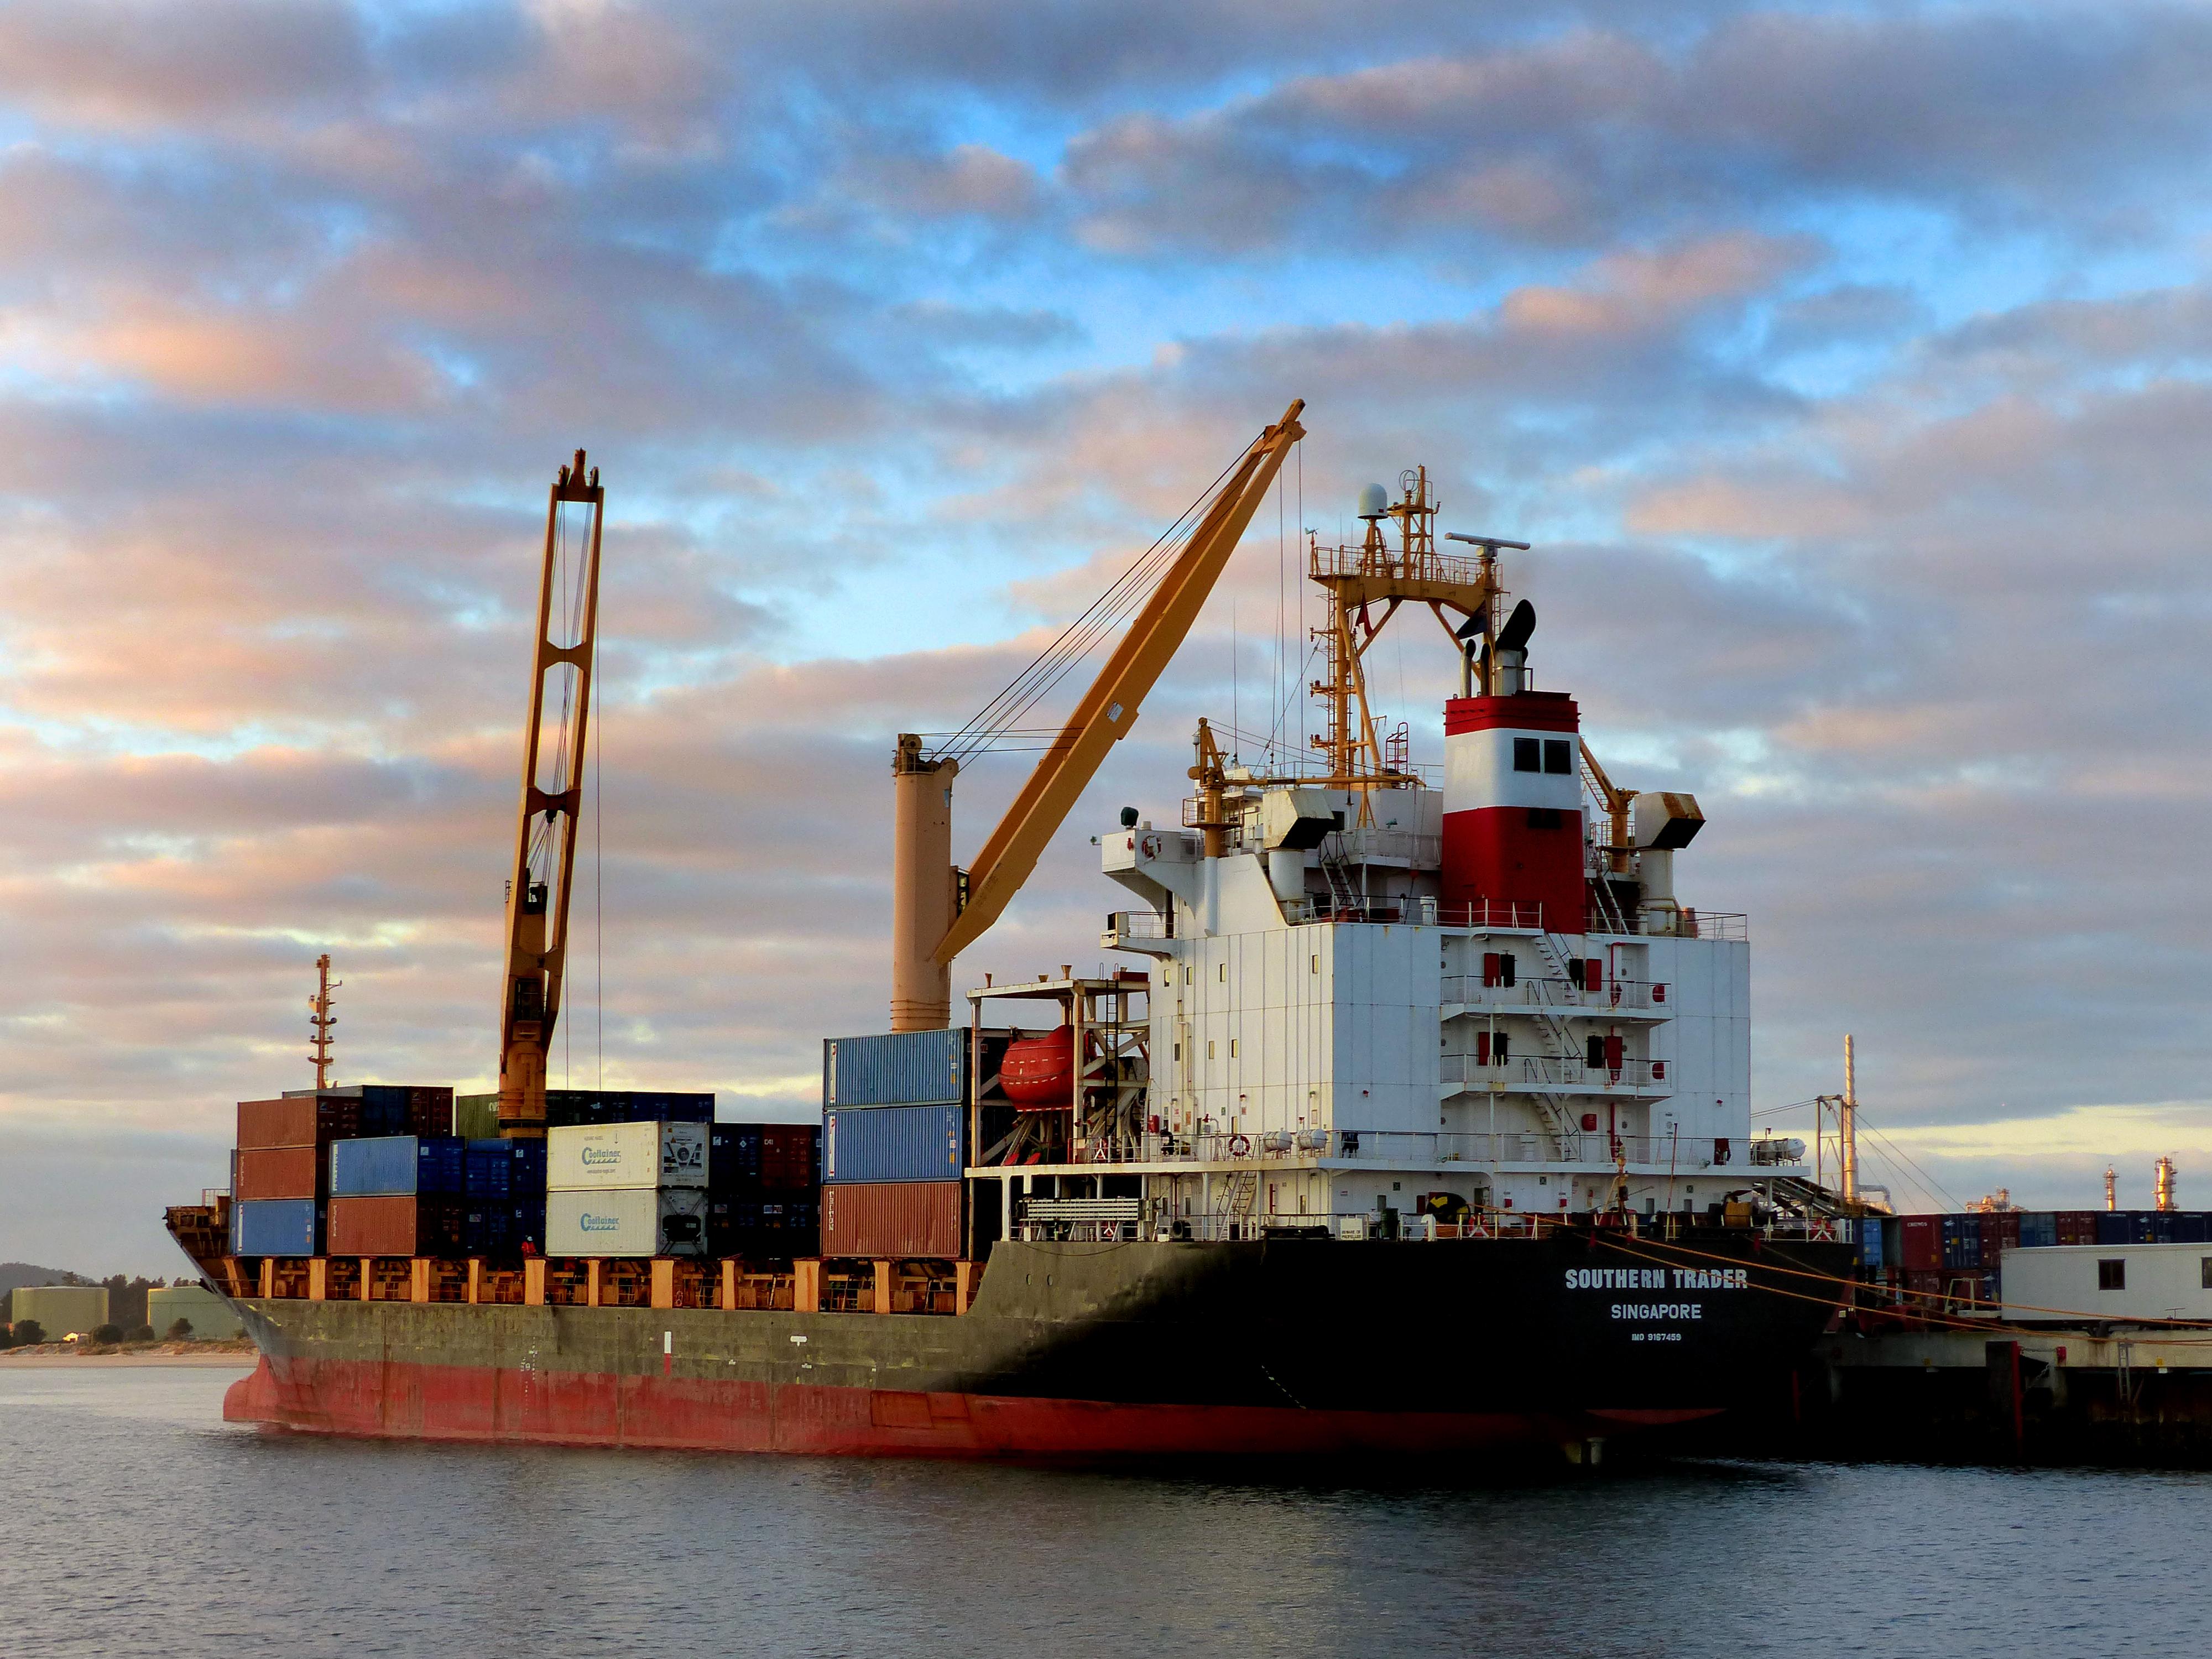 Gambar Laut Mengangkut Kendaraan Pelabuhan Kapal Kargo Area Publik Infrastruktur Muatan Saluran Pengiriman Lumixfz Bridgecamera